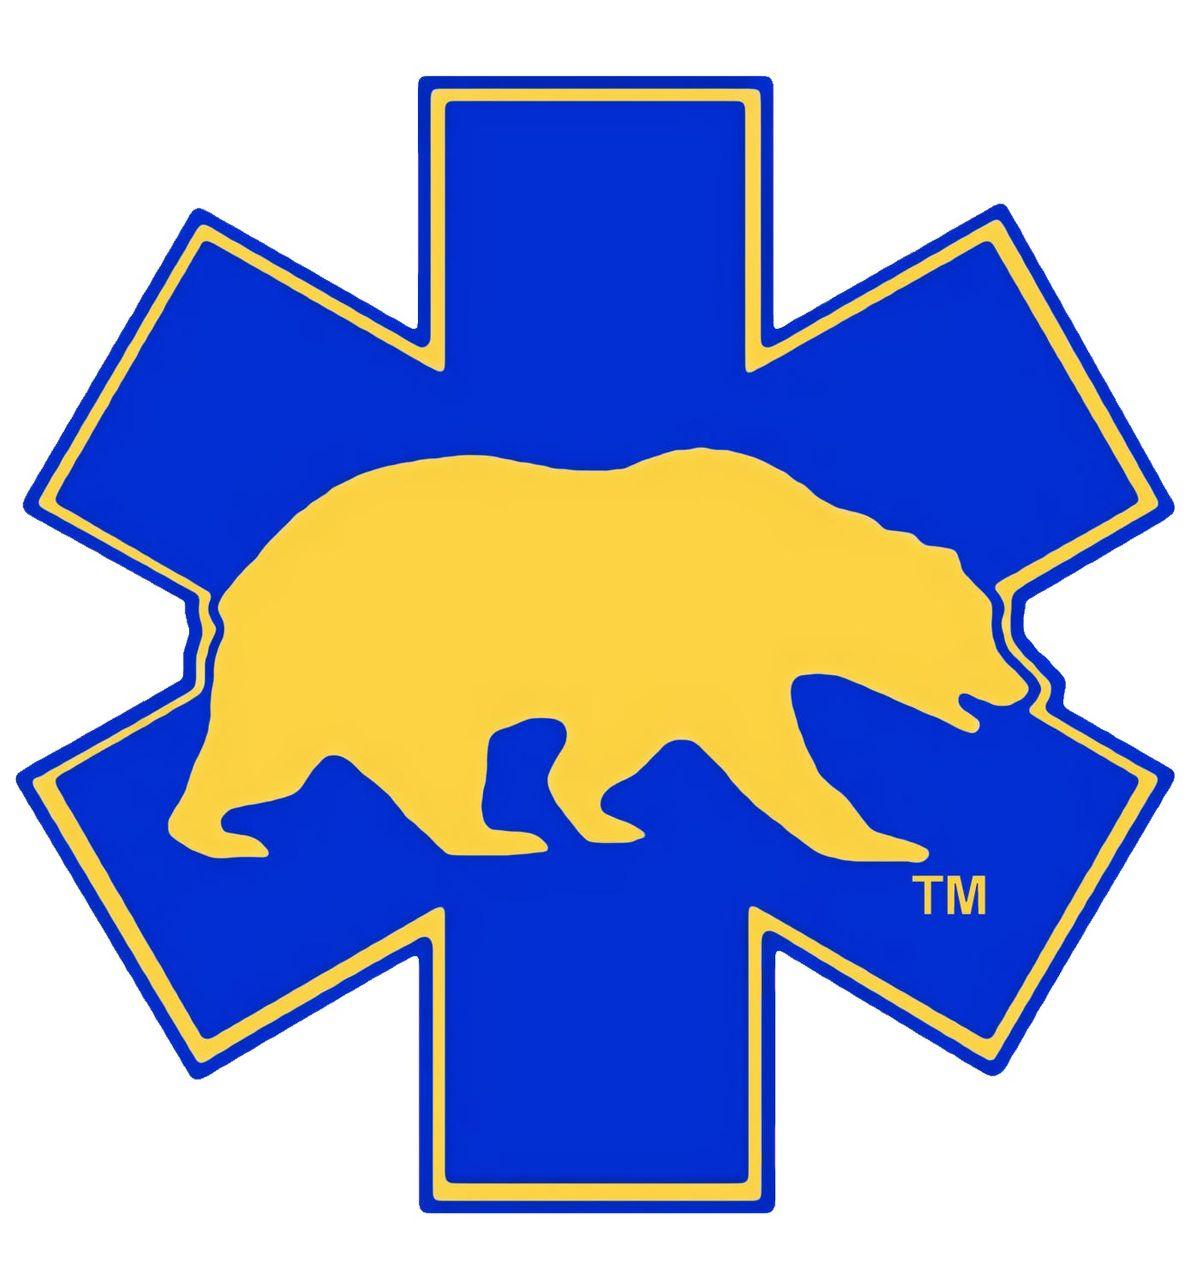 BMRC CPR Class (AHA Basic Life Support [BLS]) 2-23-19